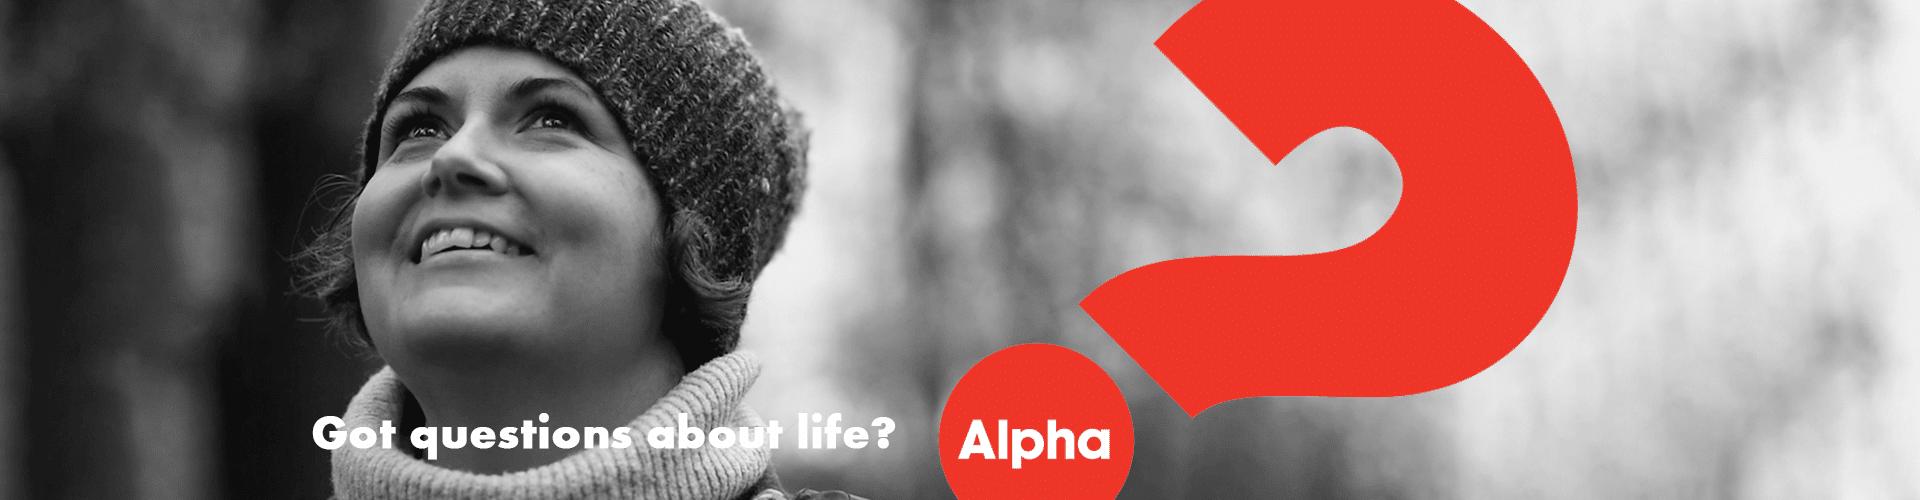 alpha 1 1 - Alpha